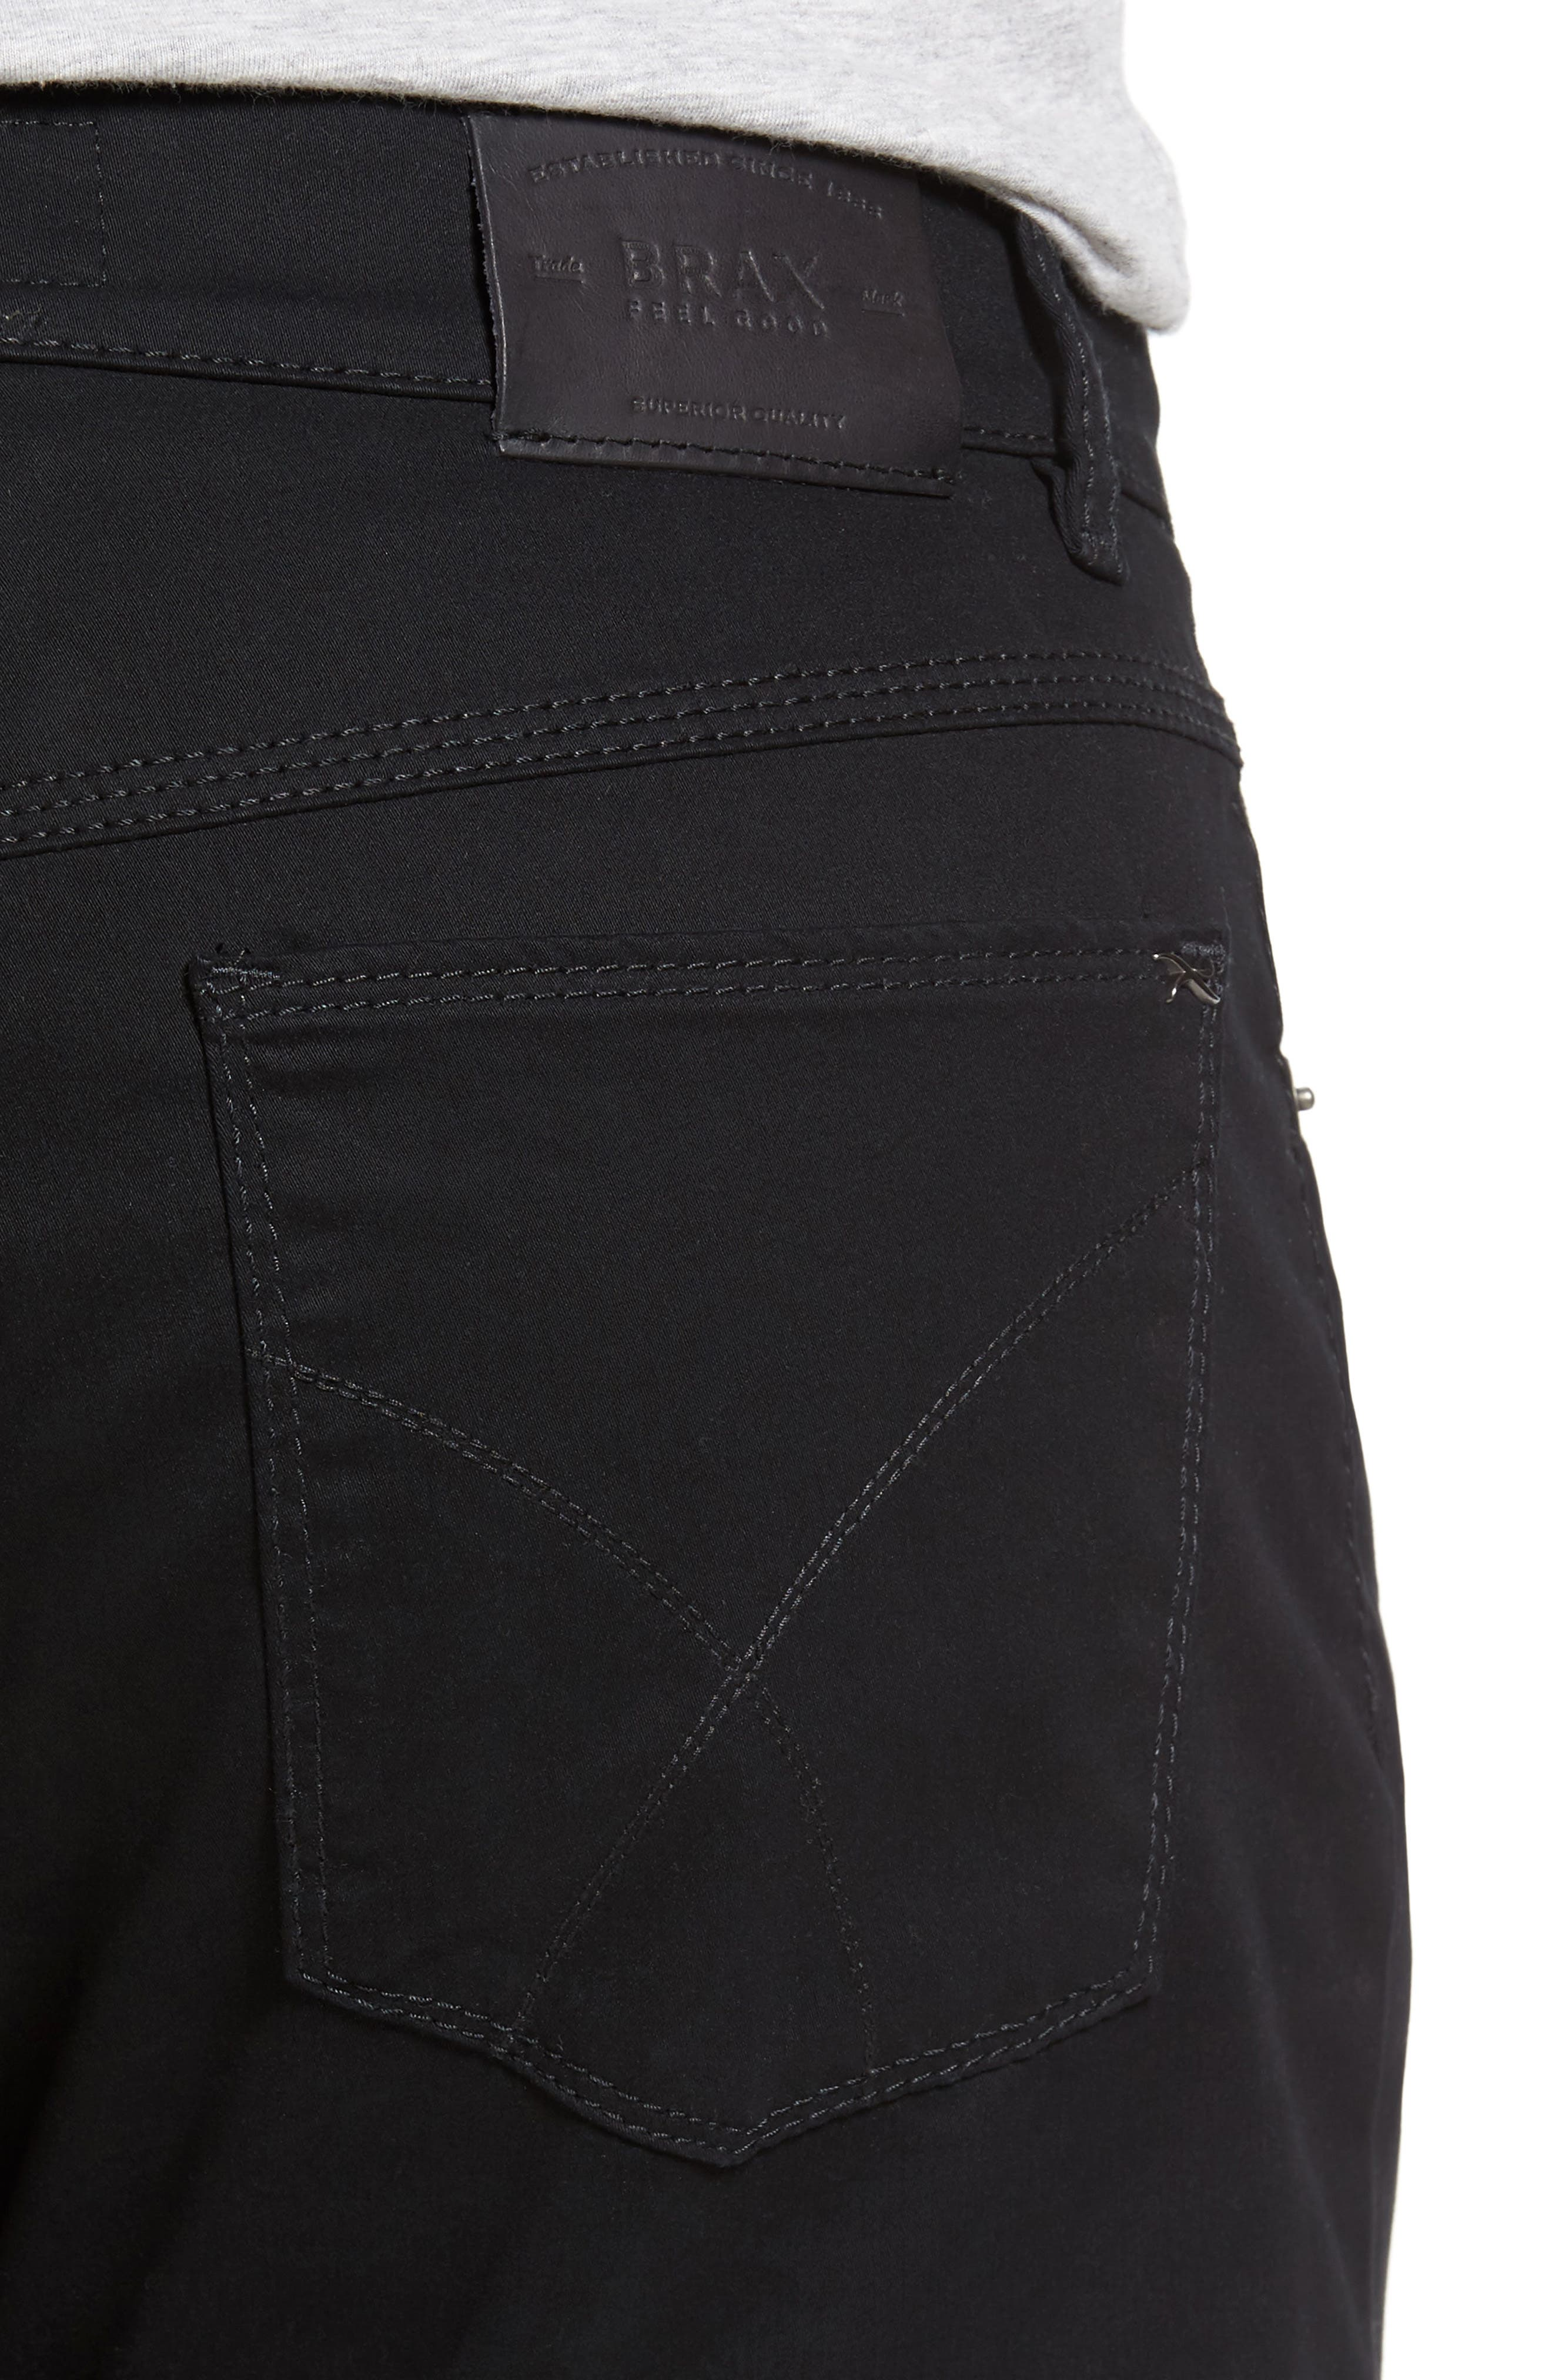 Cooper Prestige Stretch Cotton Pants,                             Alternate thumbnail 5, color,                             PERMA BLACK